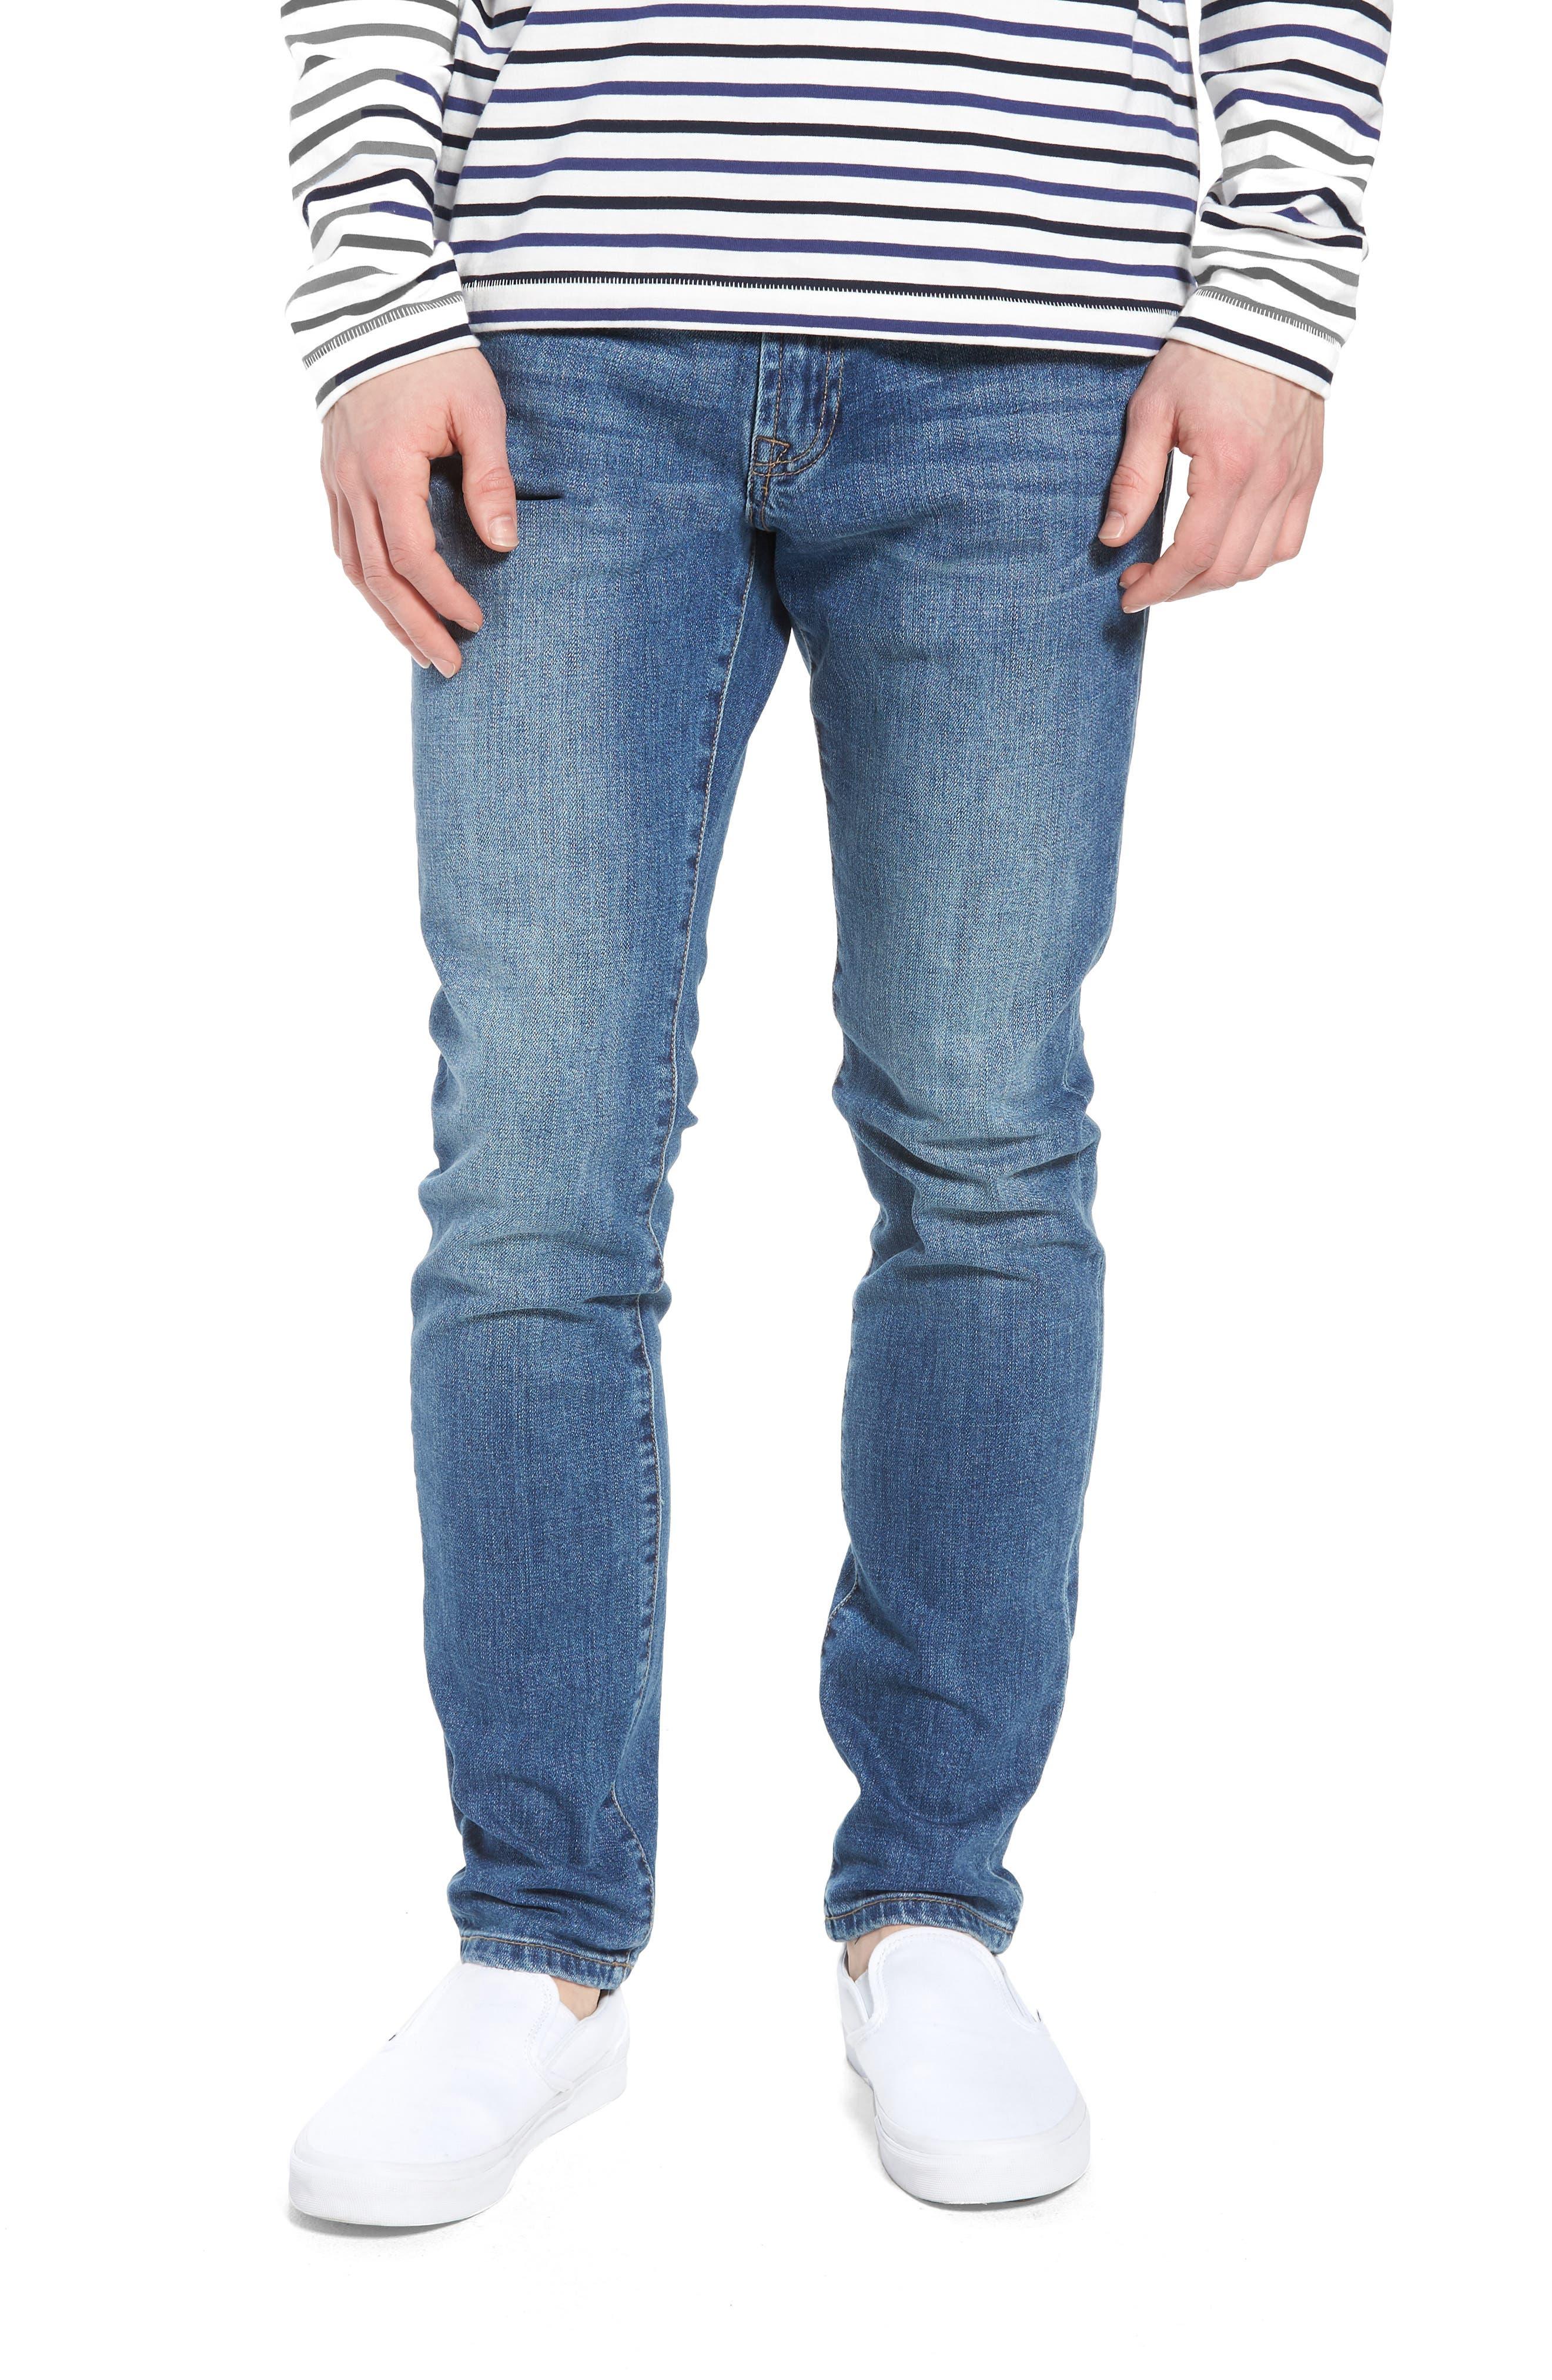 Jeans Co. Bond Skinny Fit Jeans,                         Main,                         color, Bryson Vintage Medium